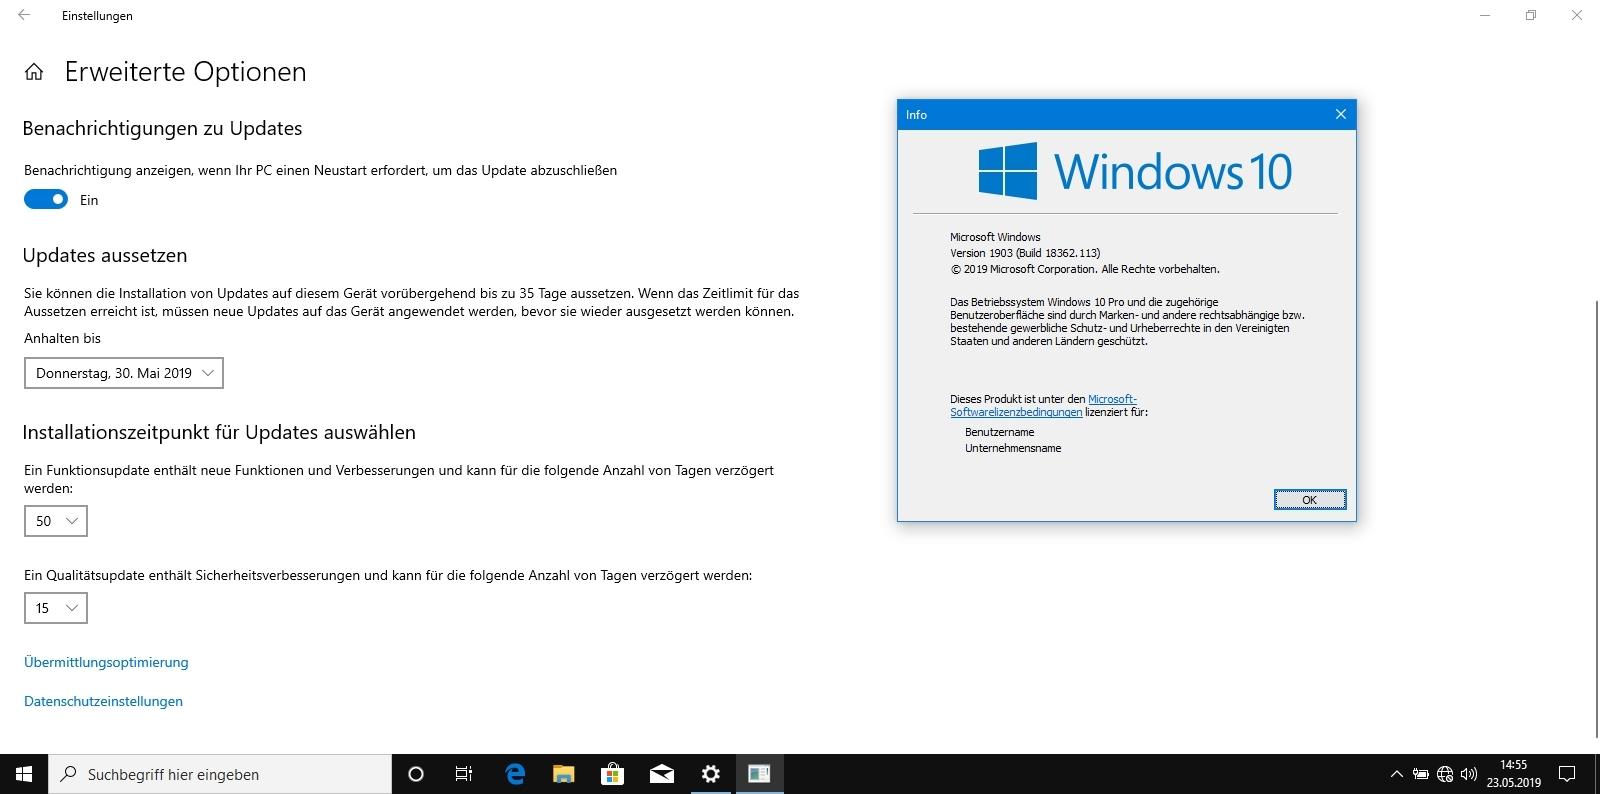 Windows-10-1903-18362-113-Windows-Update-2 — imgbb com